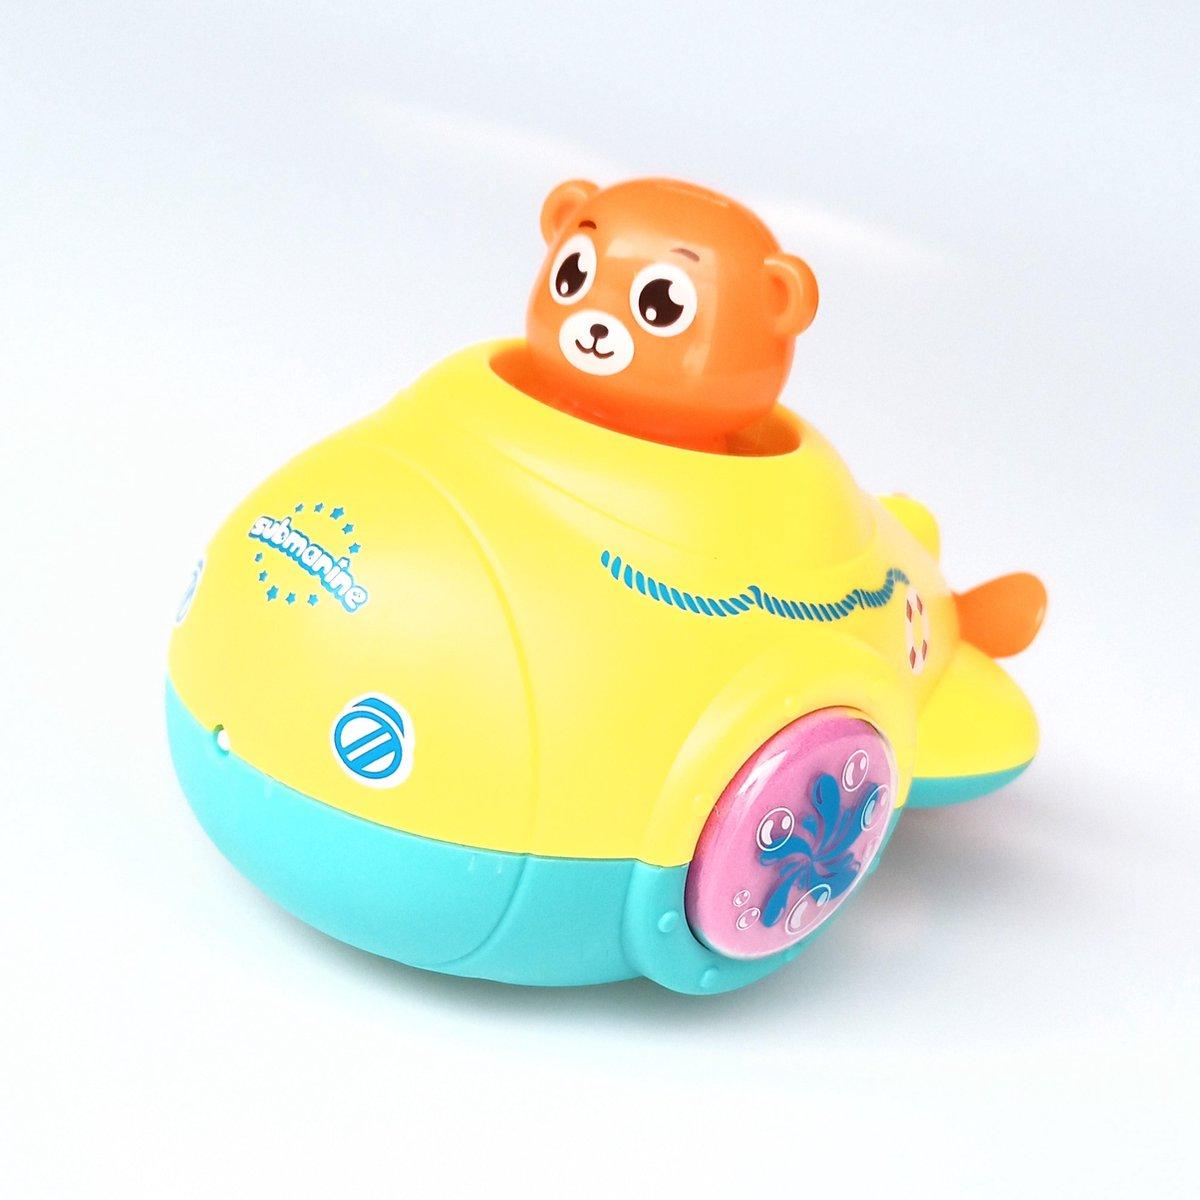 Jobber Waterplay Badspeelgoed - Onderzeeër Bad Boot - Submarine